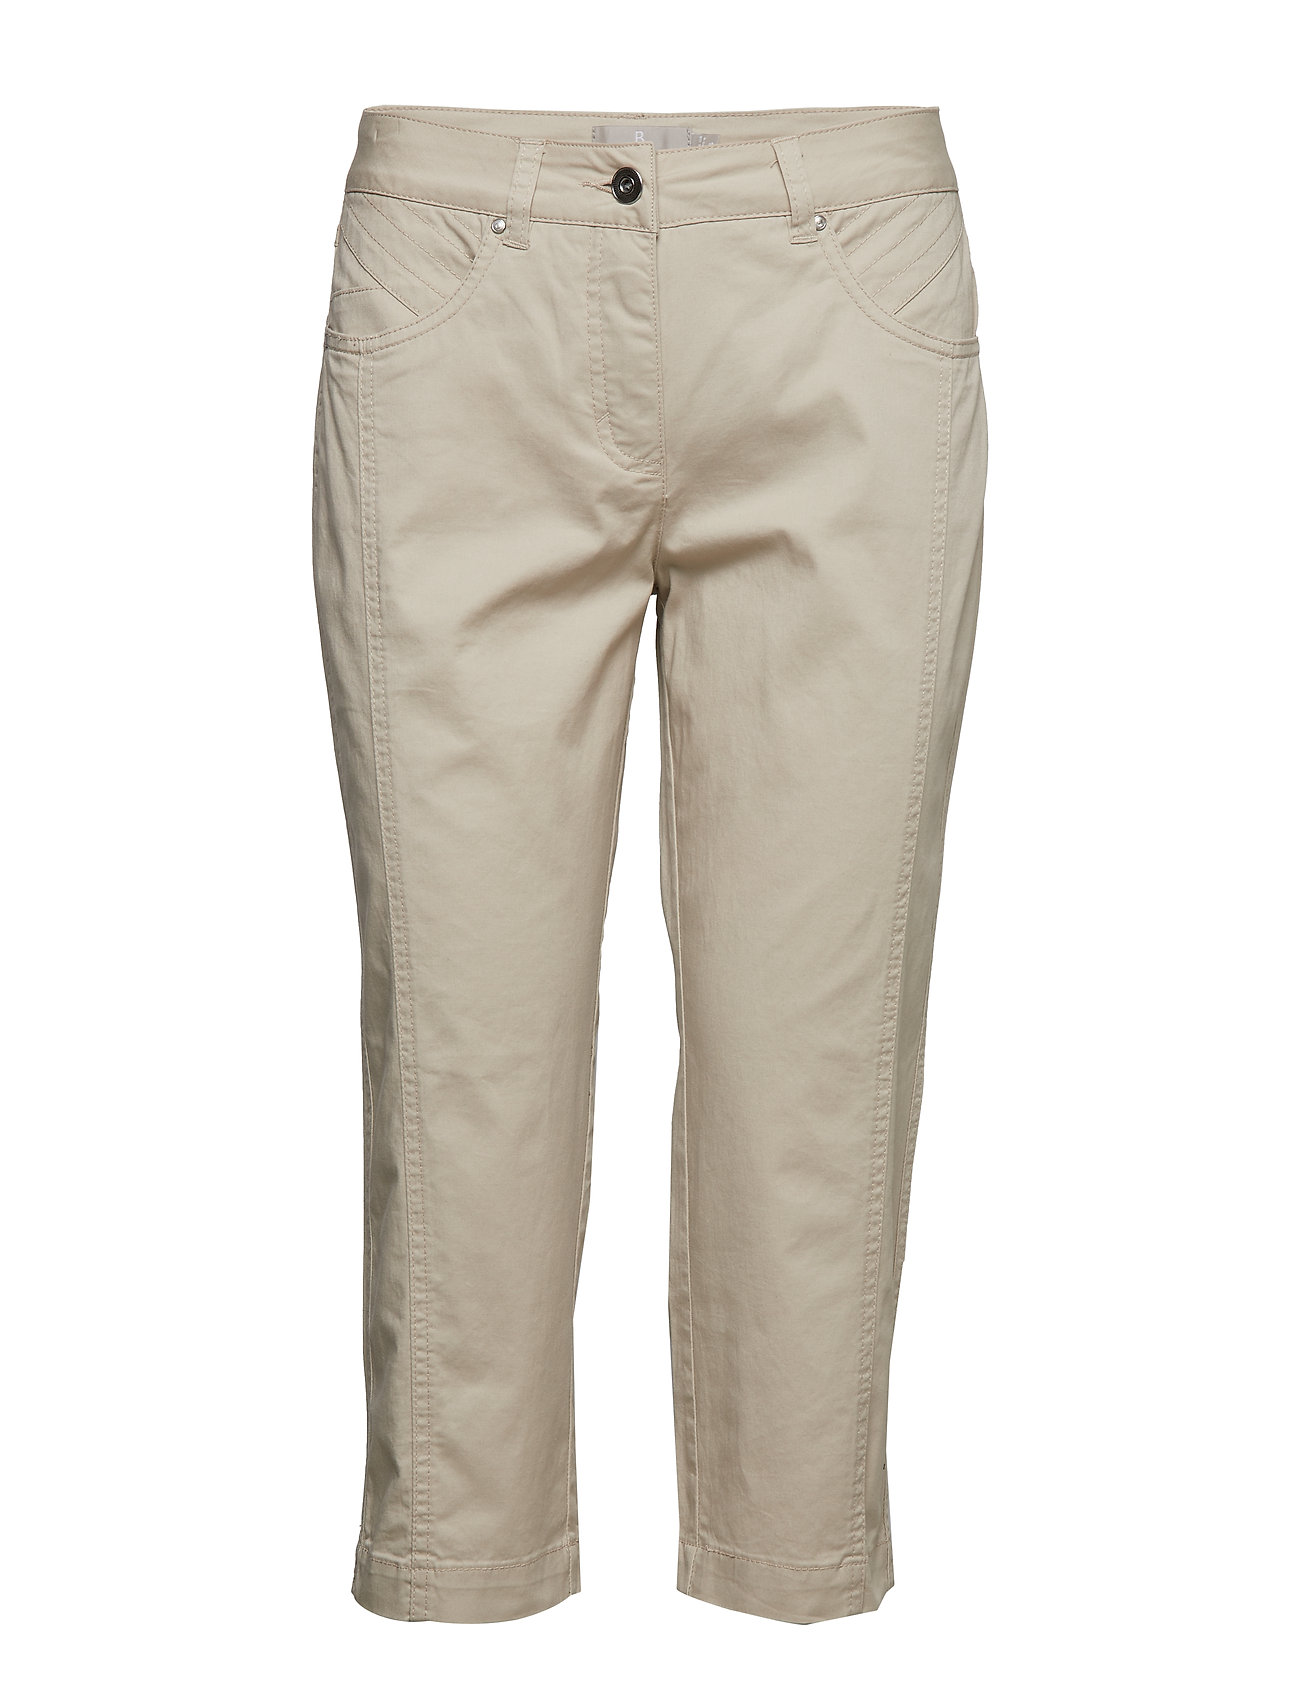 Brandtex Capri pants - SAND